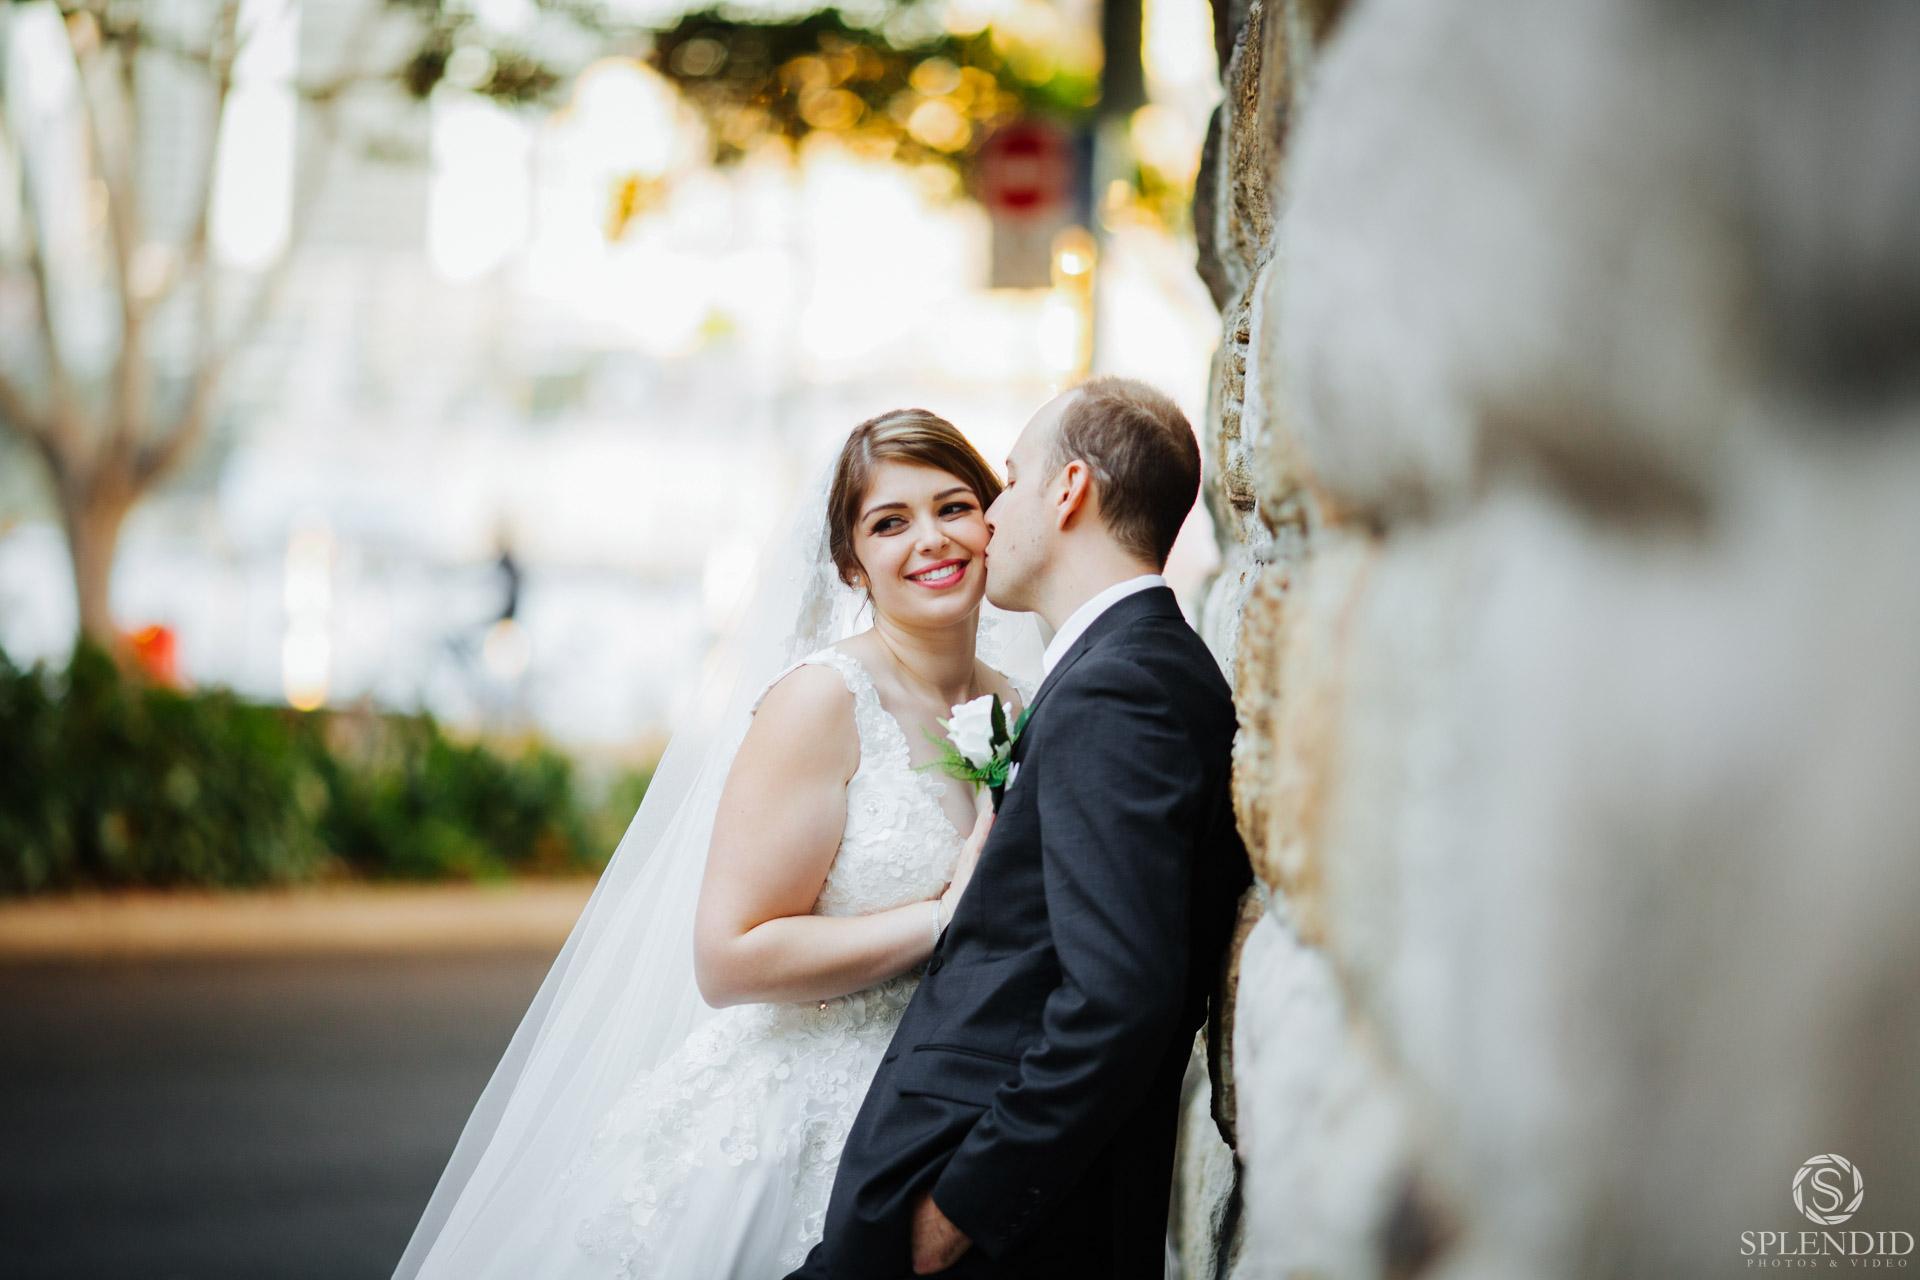 Conca D'oro Wedding: Emilia and Anthony - 32